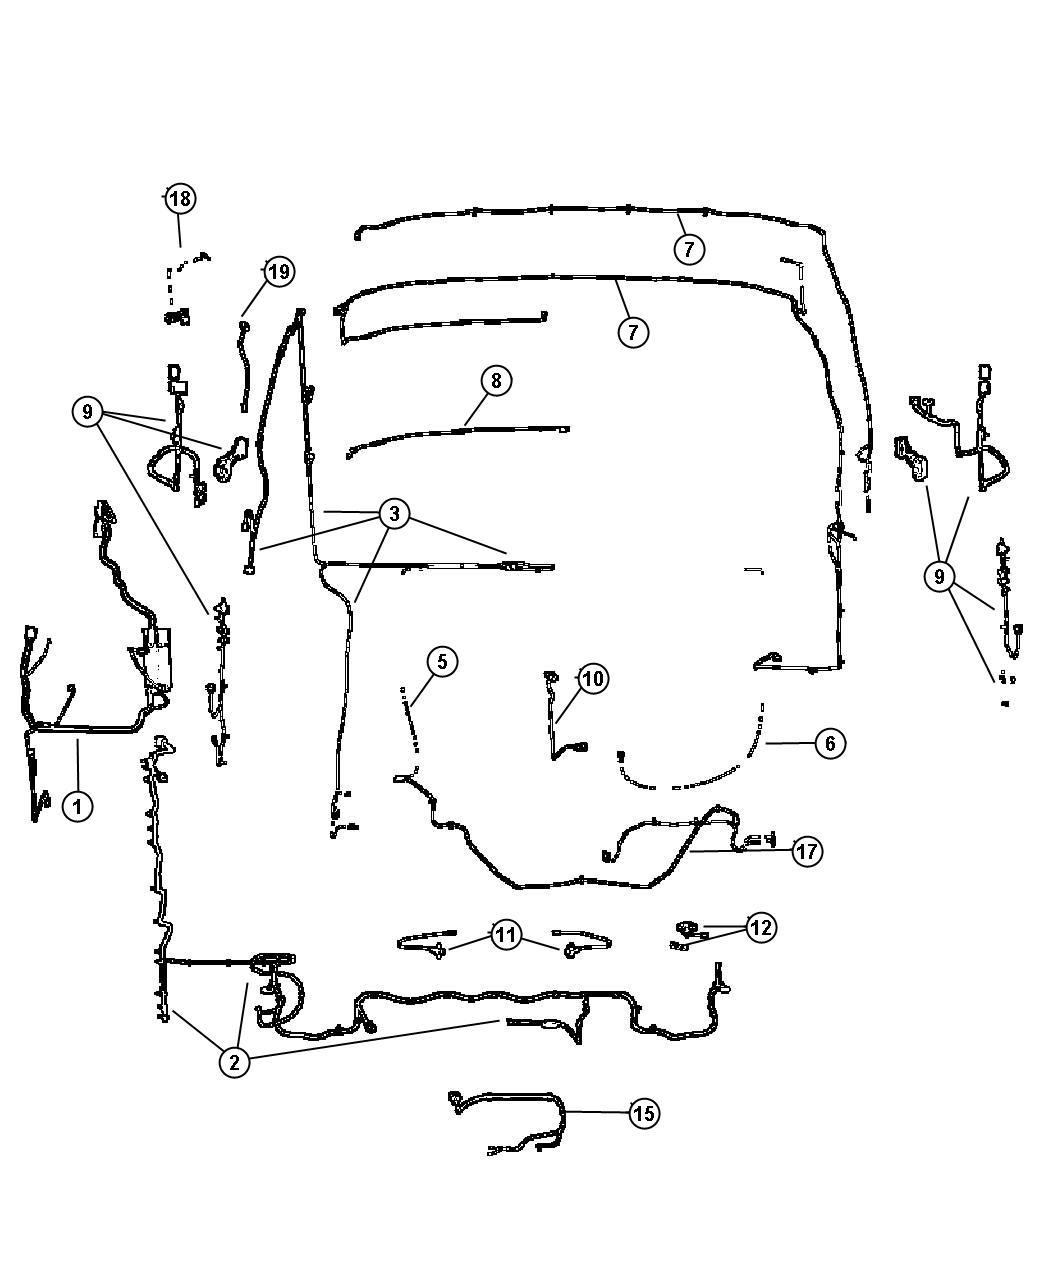 Jeep Liberty Adapter Converts 7 Way Round To 4 Way